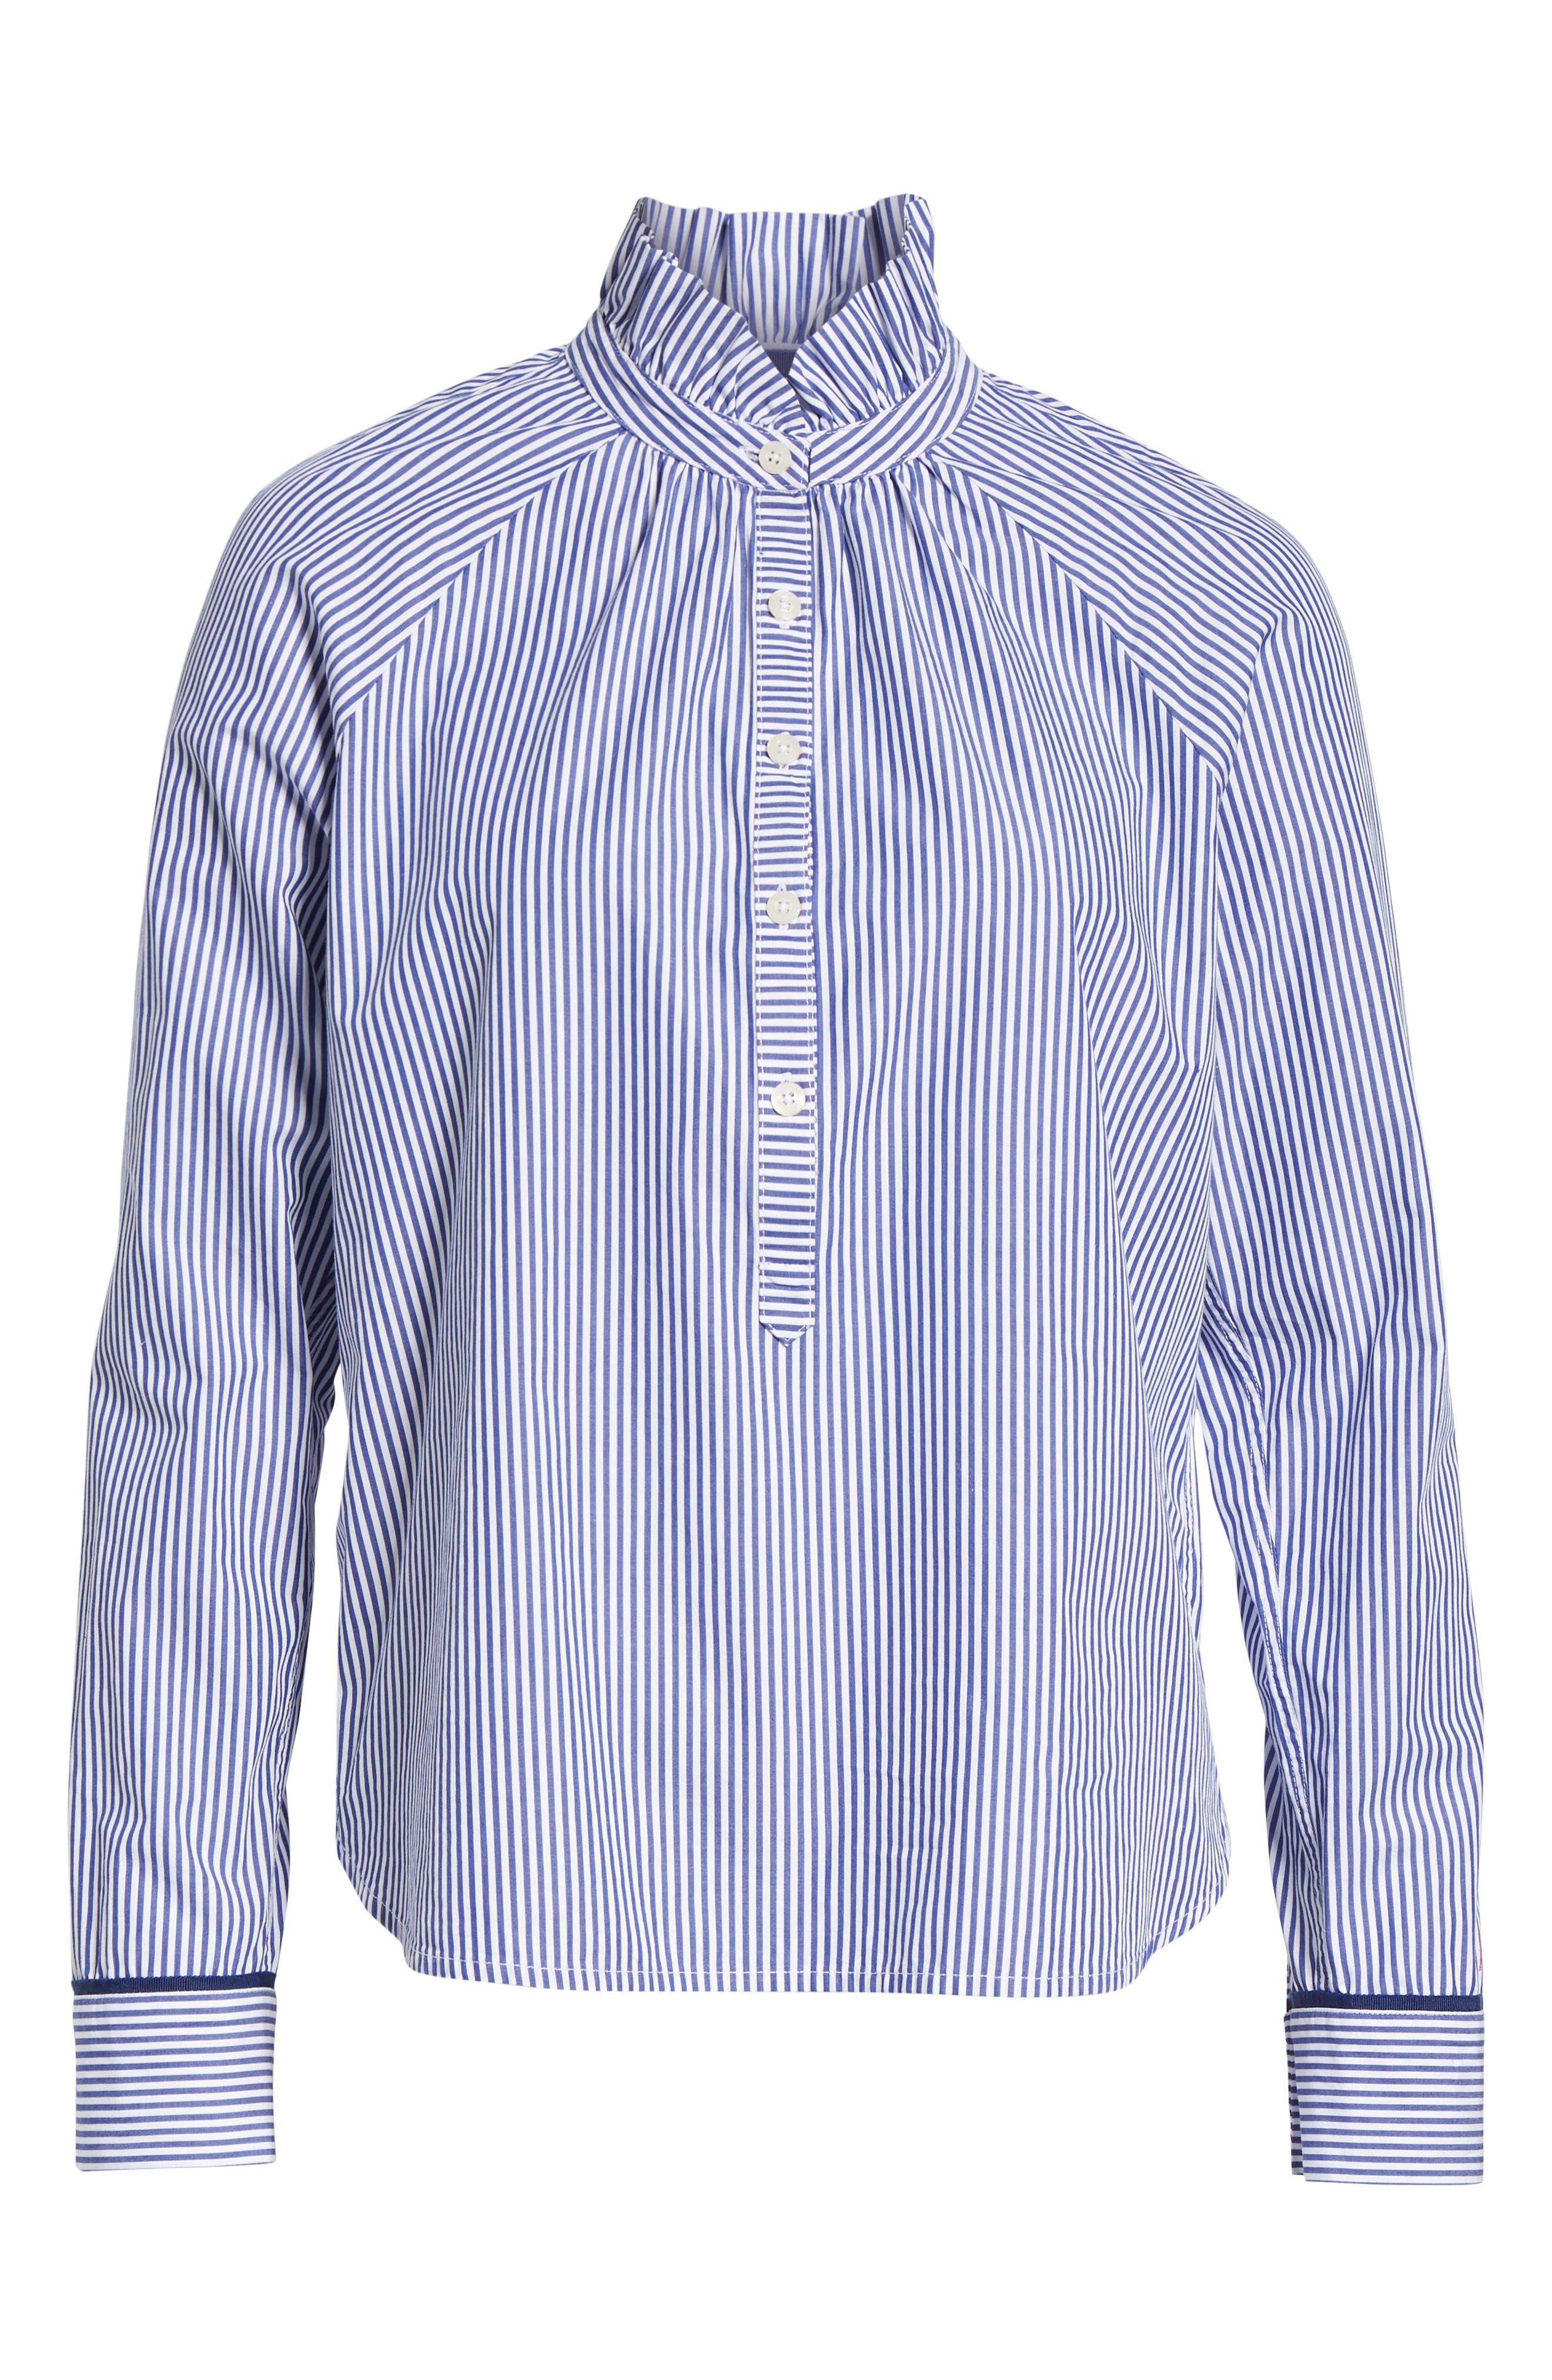 VINEYARD VINES,                             Stripe Ruffle Shirt,                             Alternate thumbnail 6, color,                             474